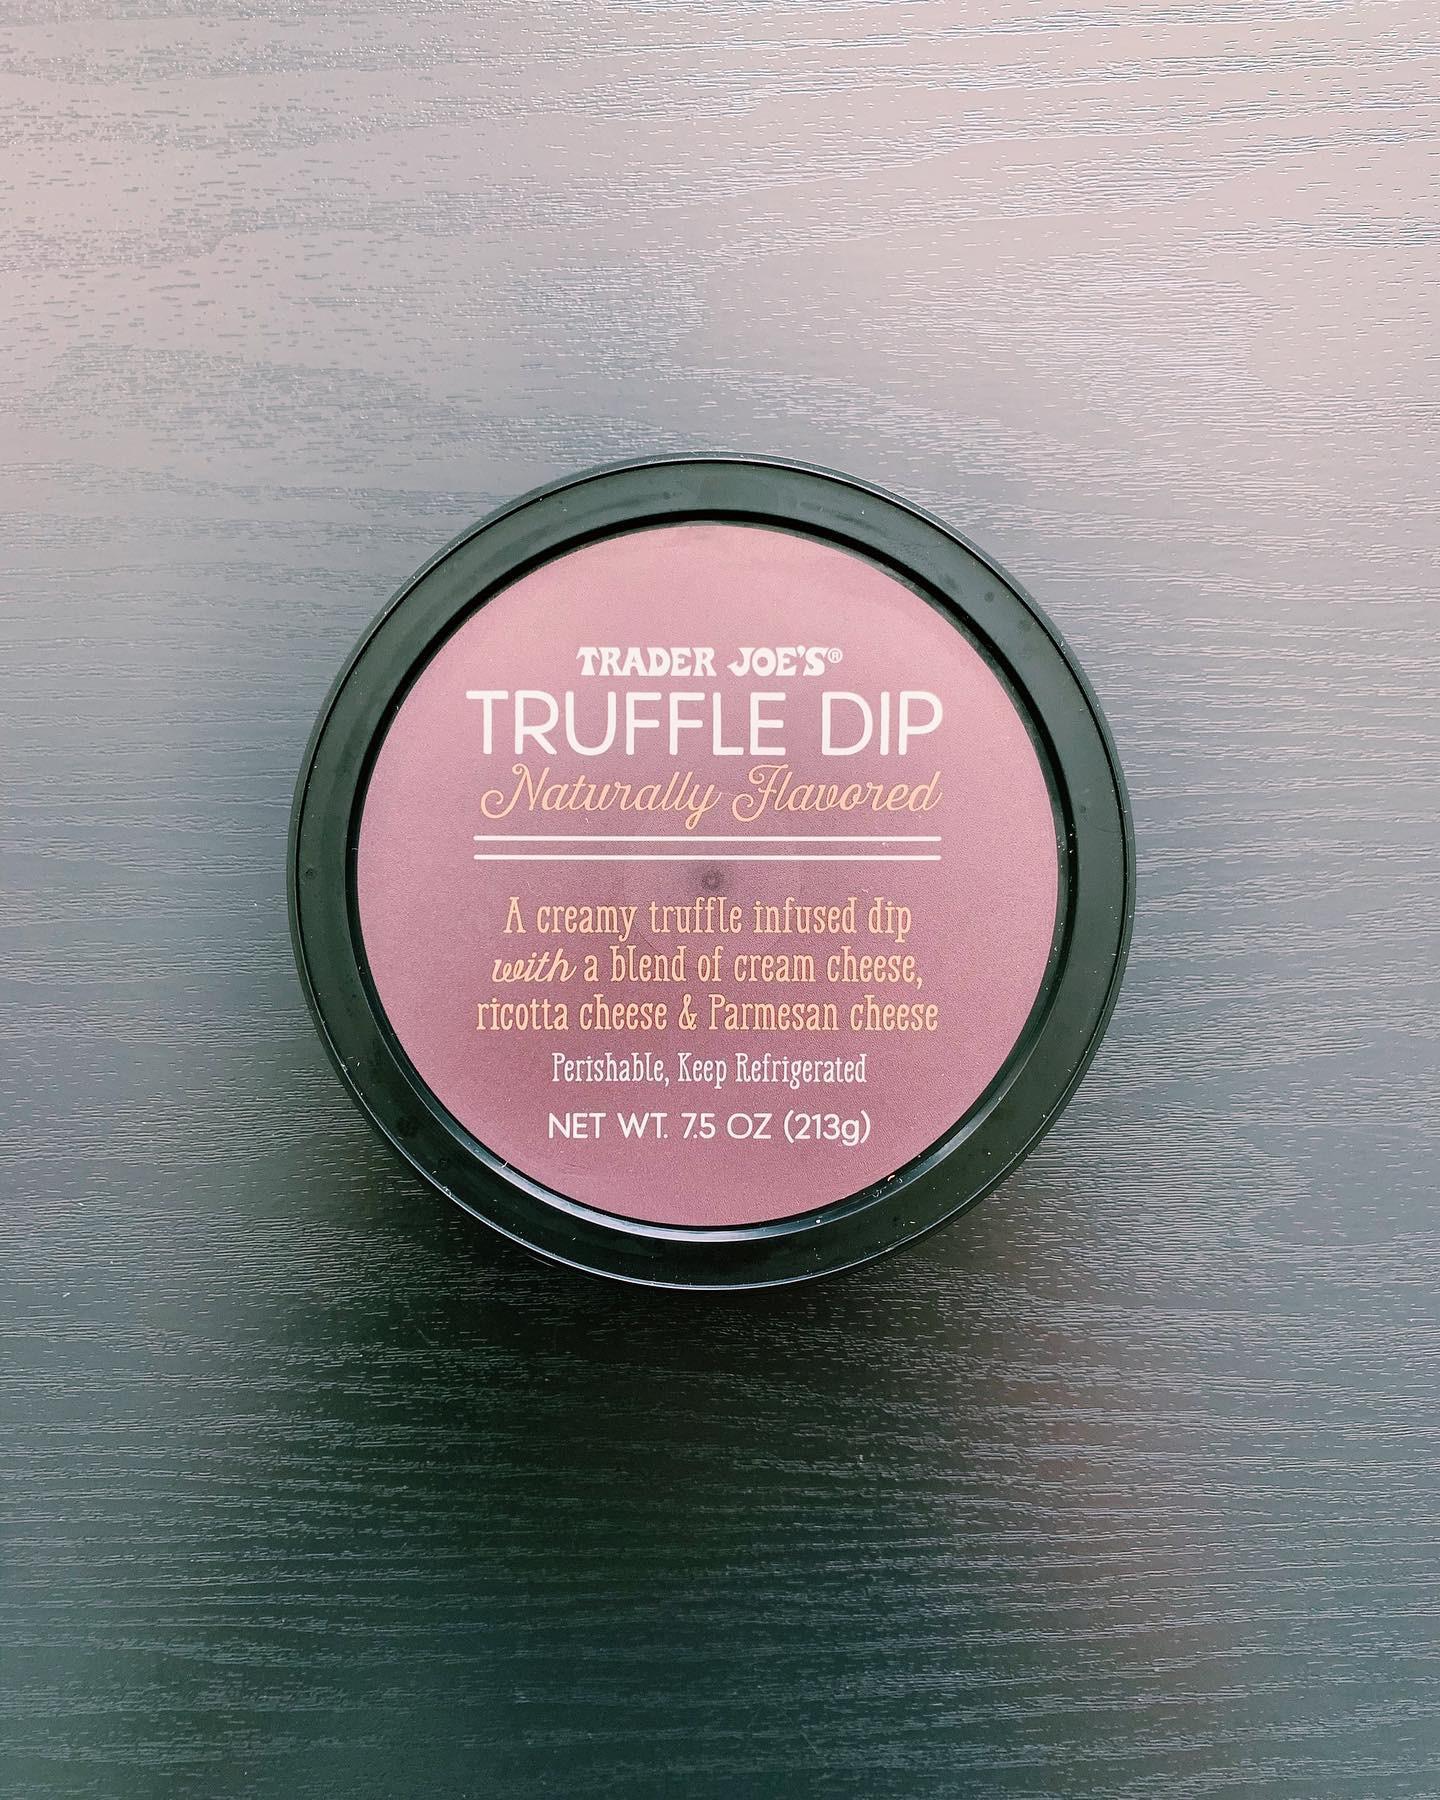 Truffle Dip: 6/10